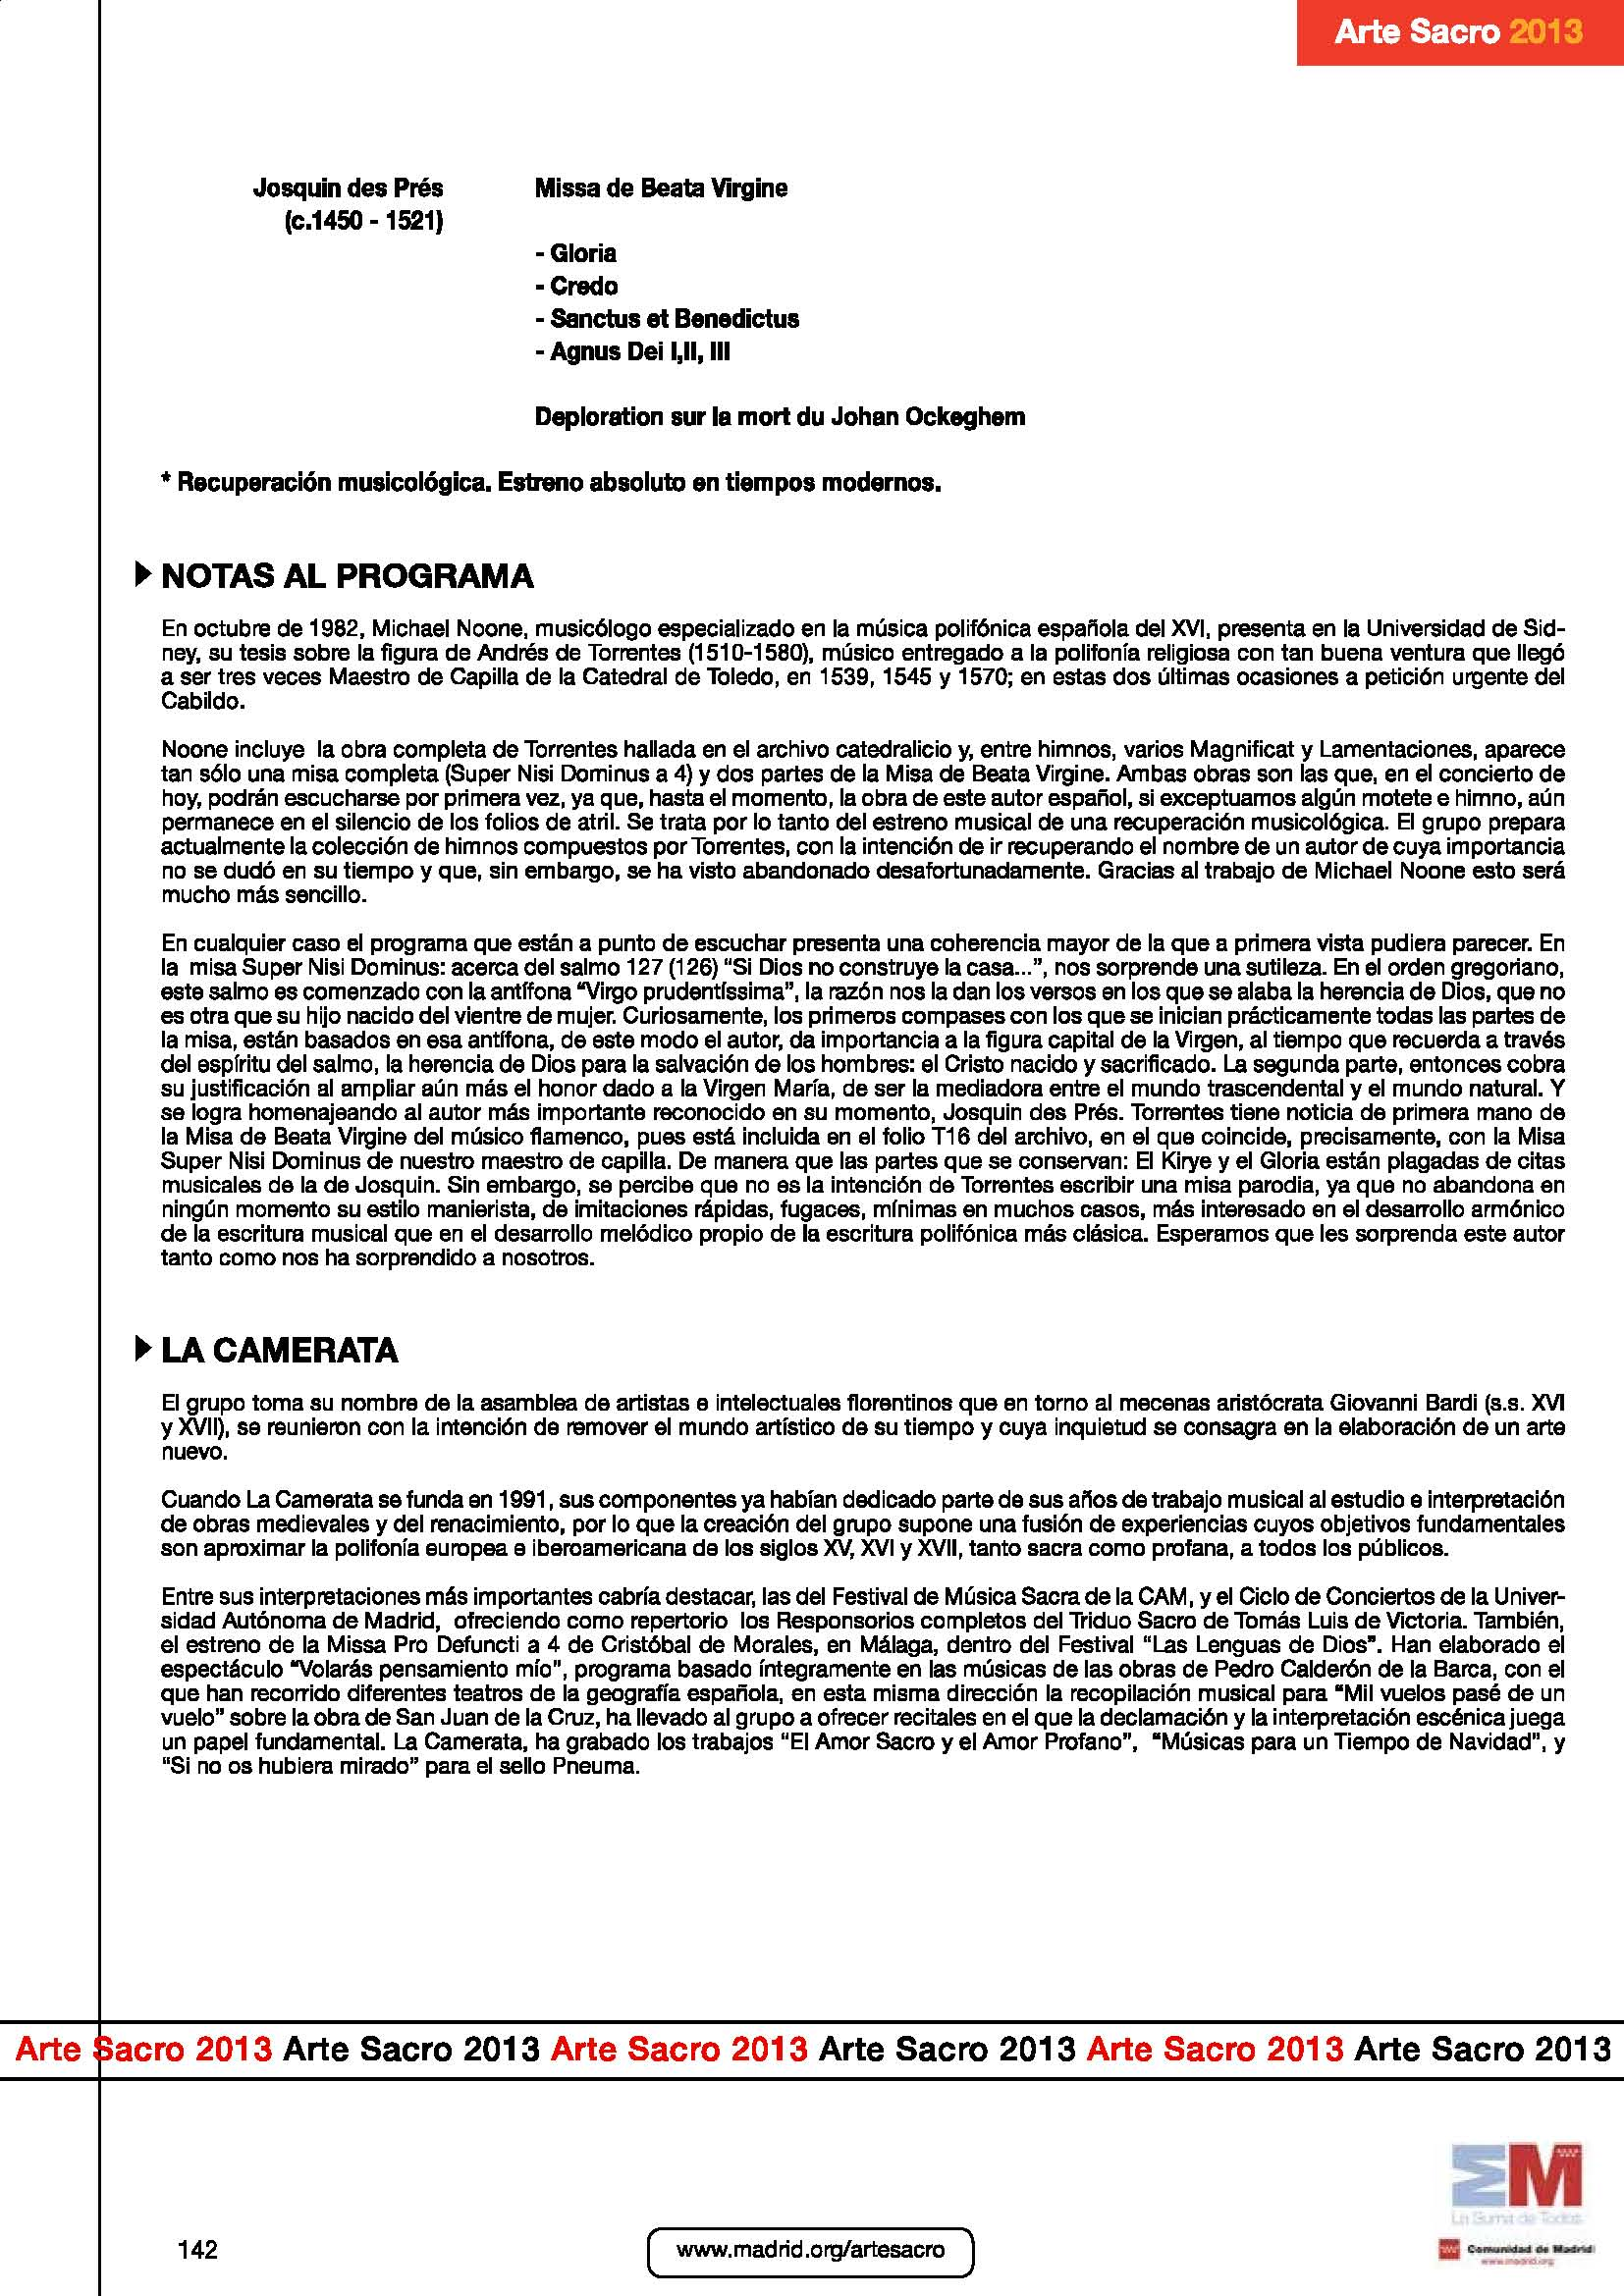 dossier_completo_Página_142